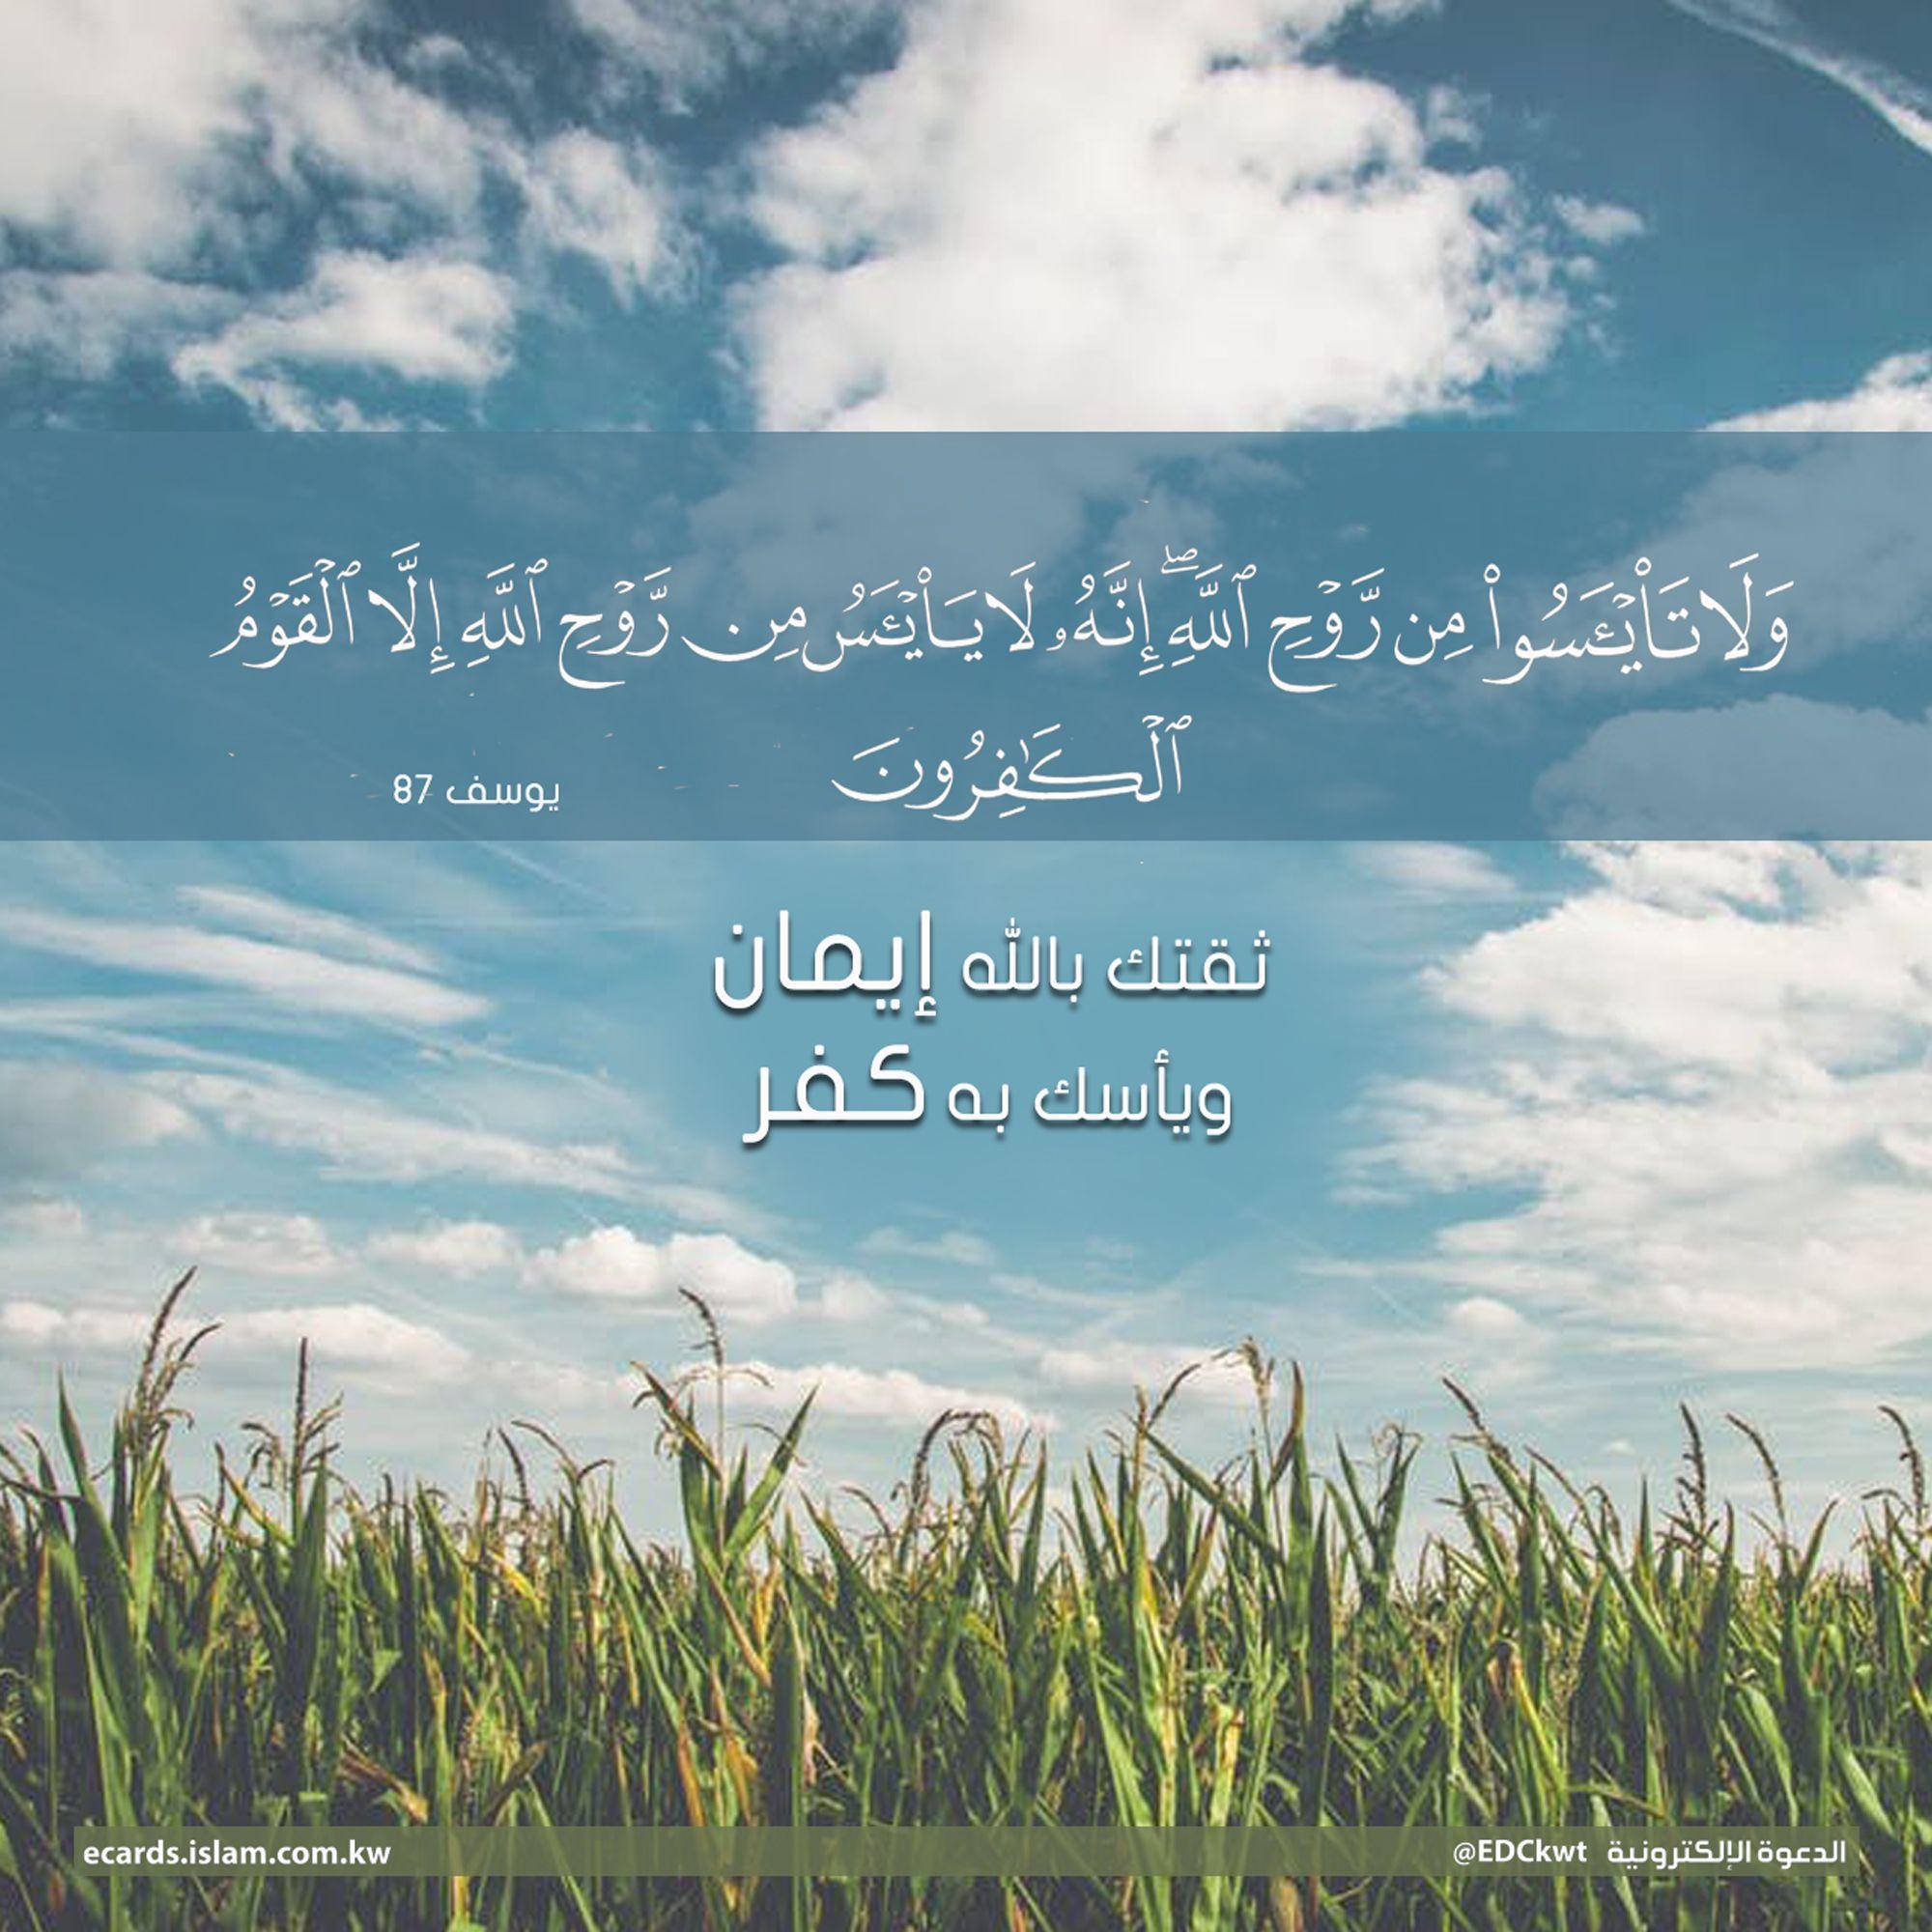 ولا تيأسوا من روح الله انه لا ييأس من روح الله الا القوم الكافرون Places To Visit Arabic Quotes Life